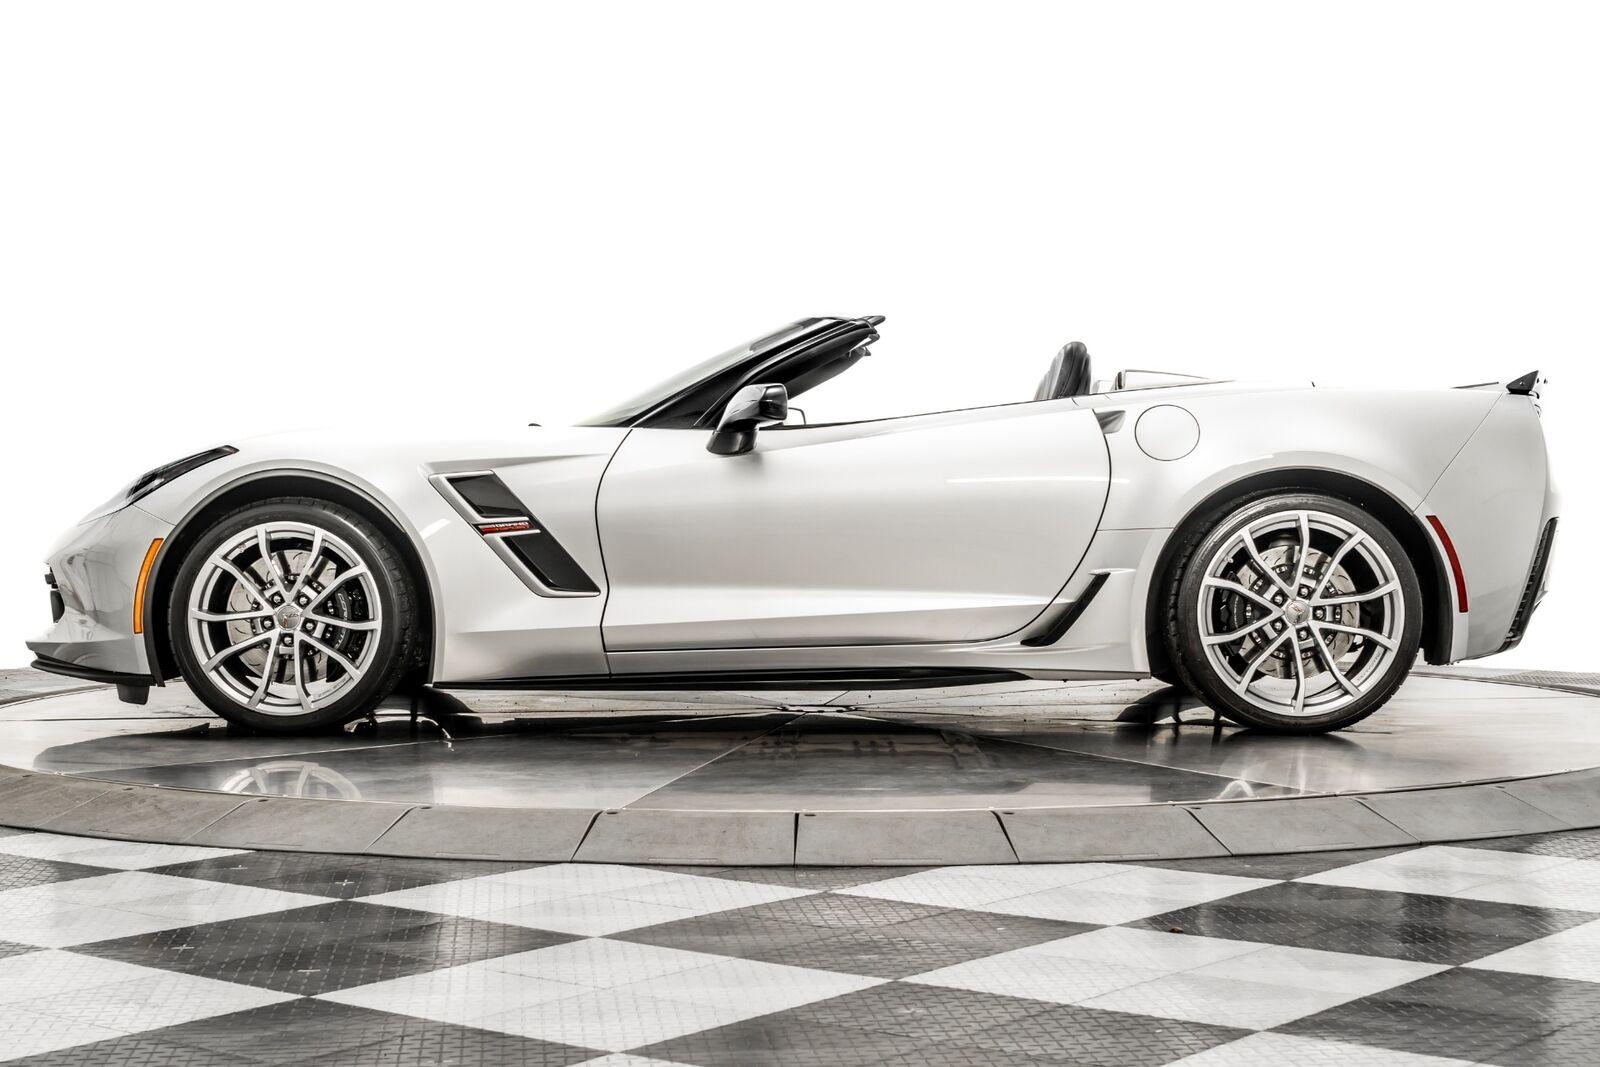 2019 Silver Chevrolet Corvette Grand Sport 2LT | C7 Corvette Photo 5